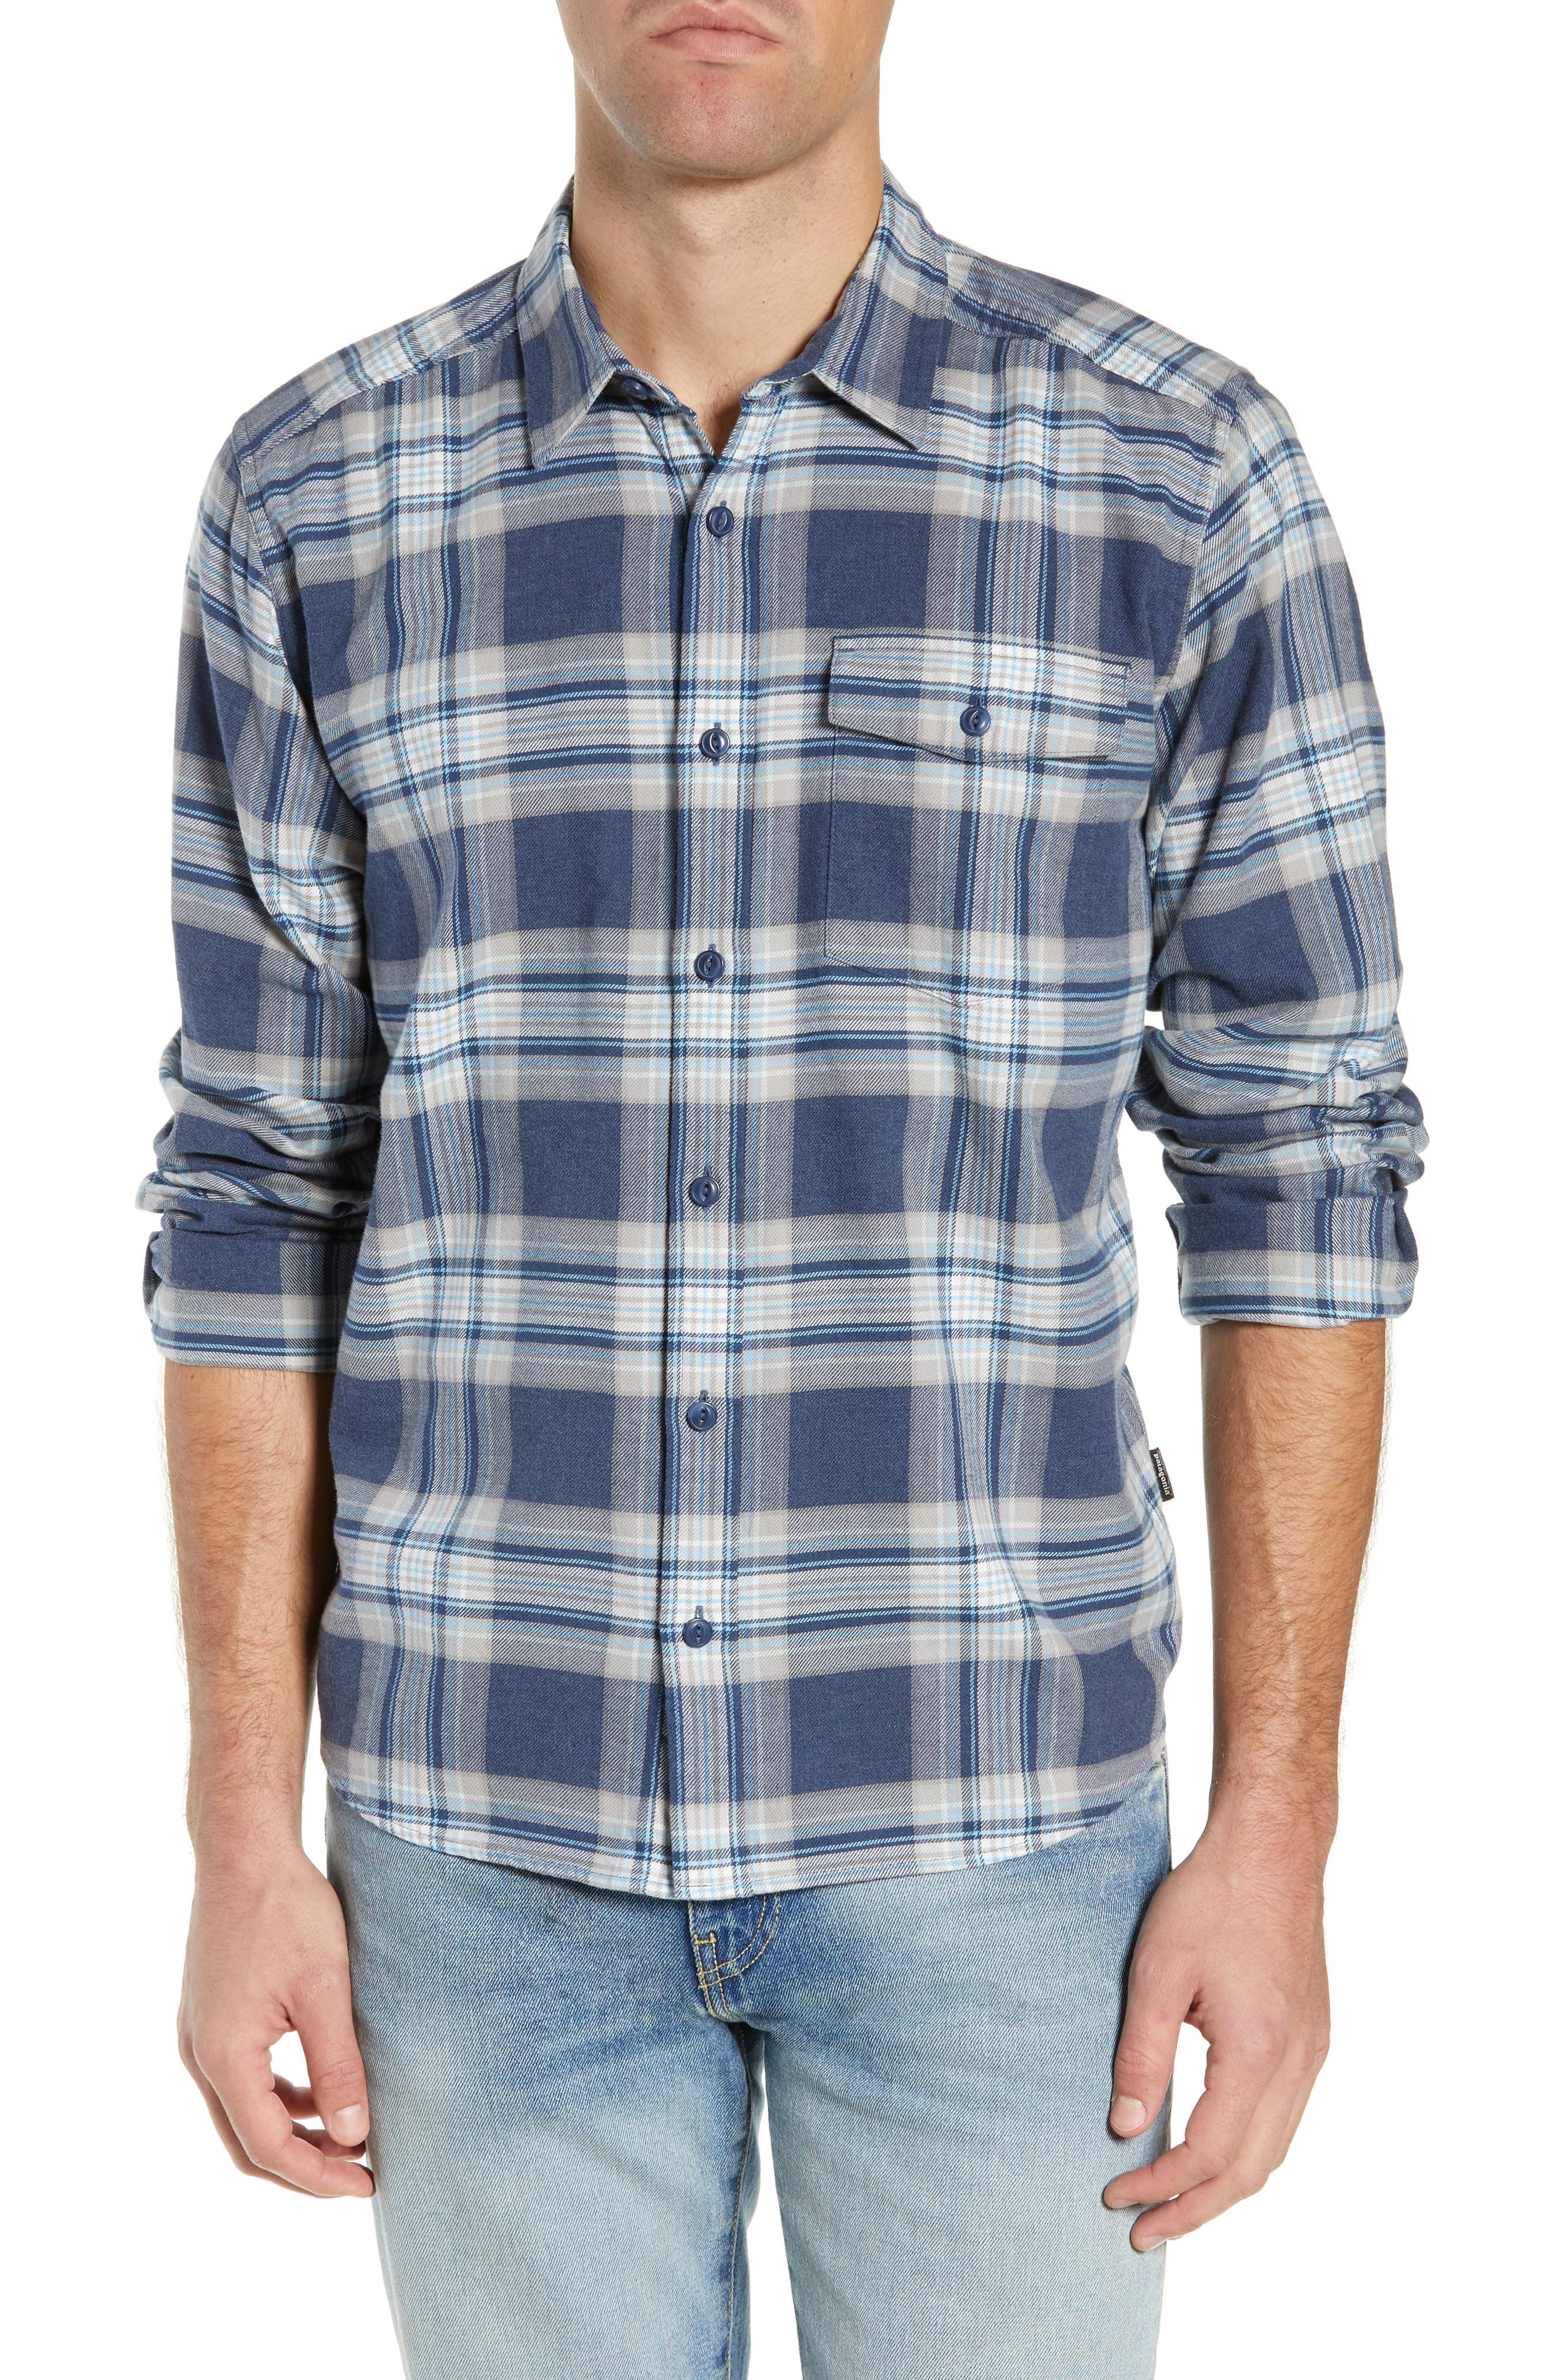 Patagonia Regular Fit Organic Cotton Flannel Shirt, Blue